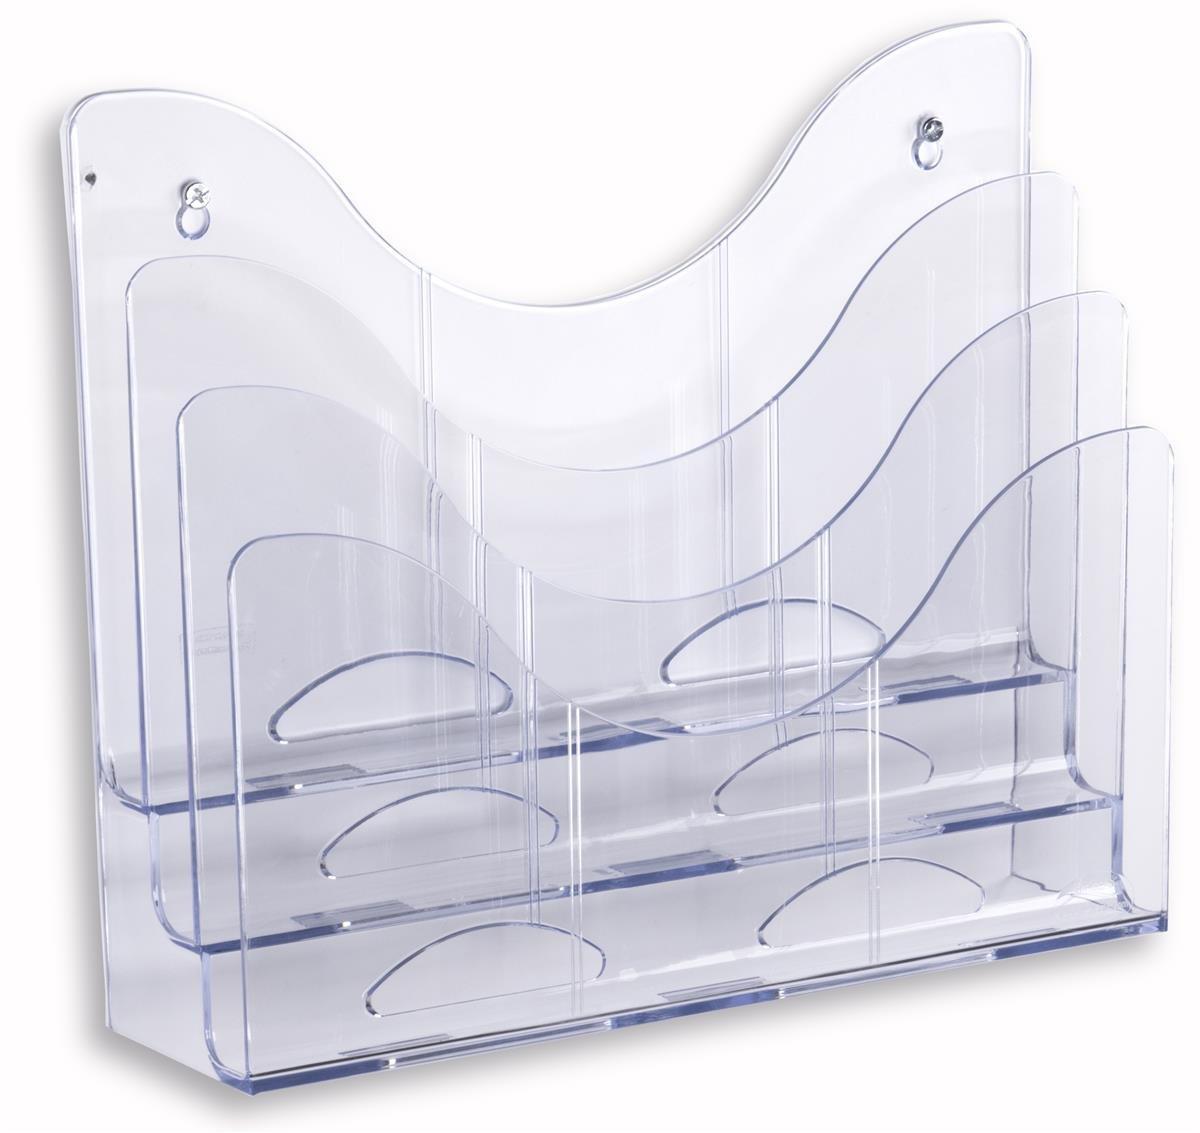 Displays2go Set of 3 - Clear File Folder Rack, 3 Tiers, Legal/Letter for Desk or Wall Mount (3LTPCKCR)